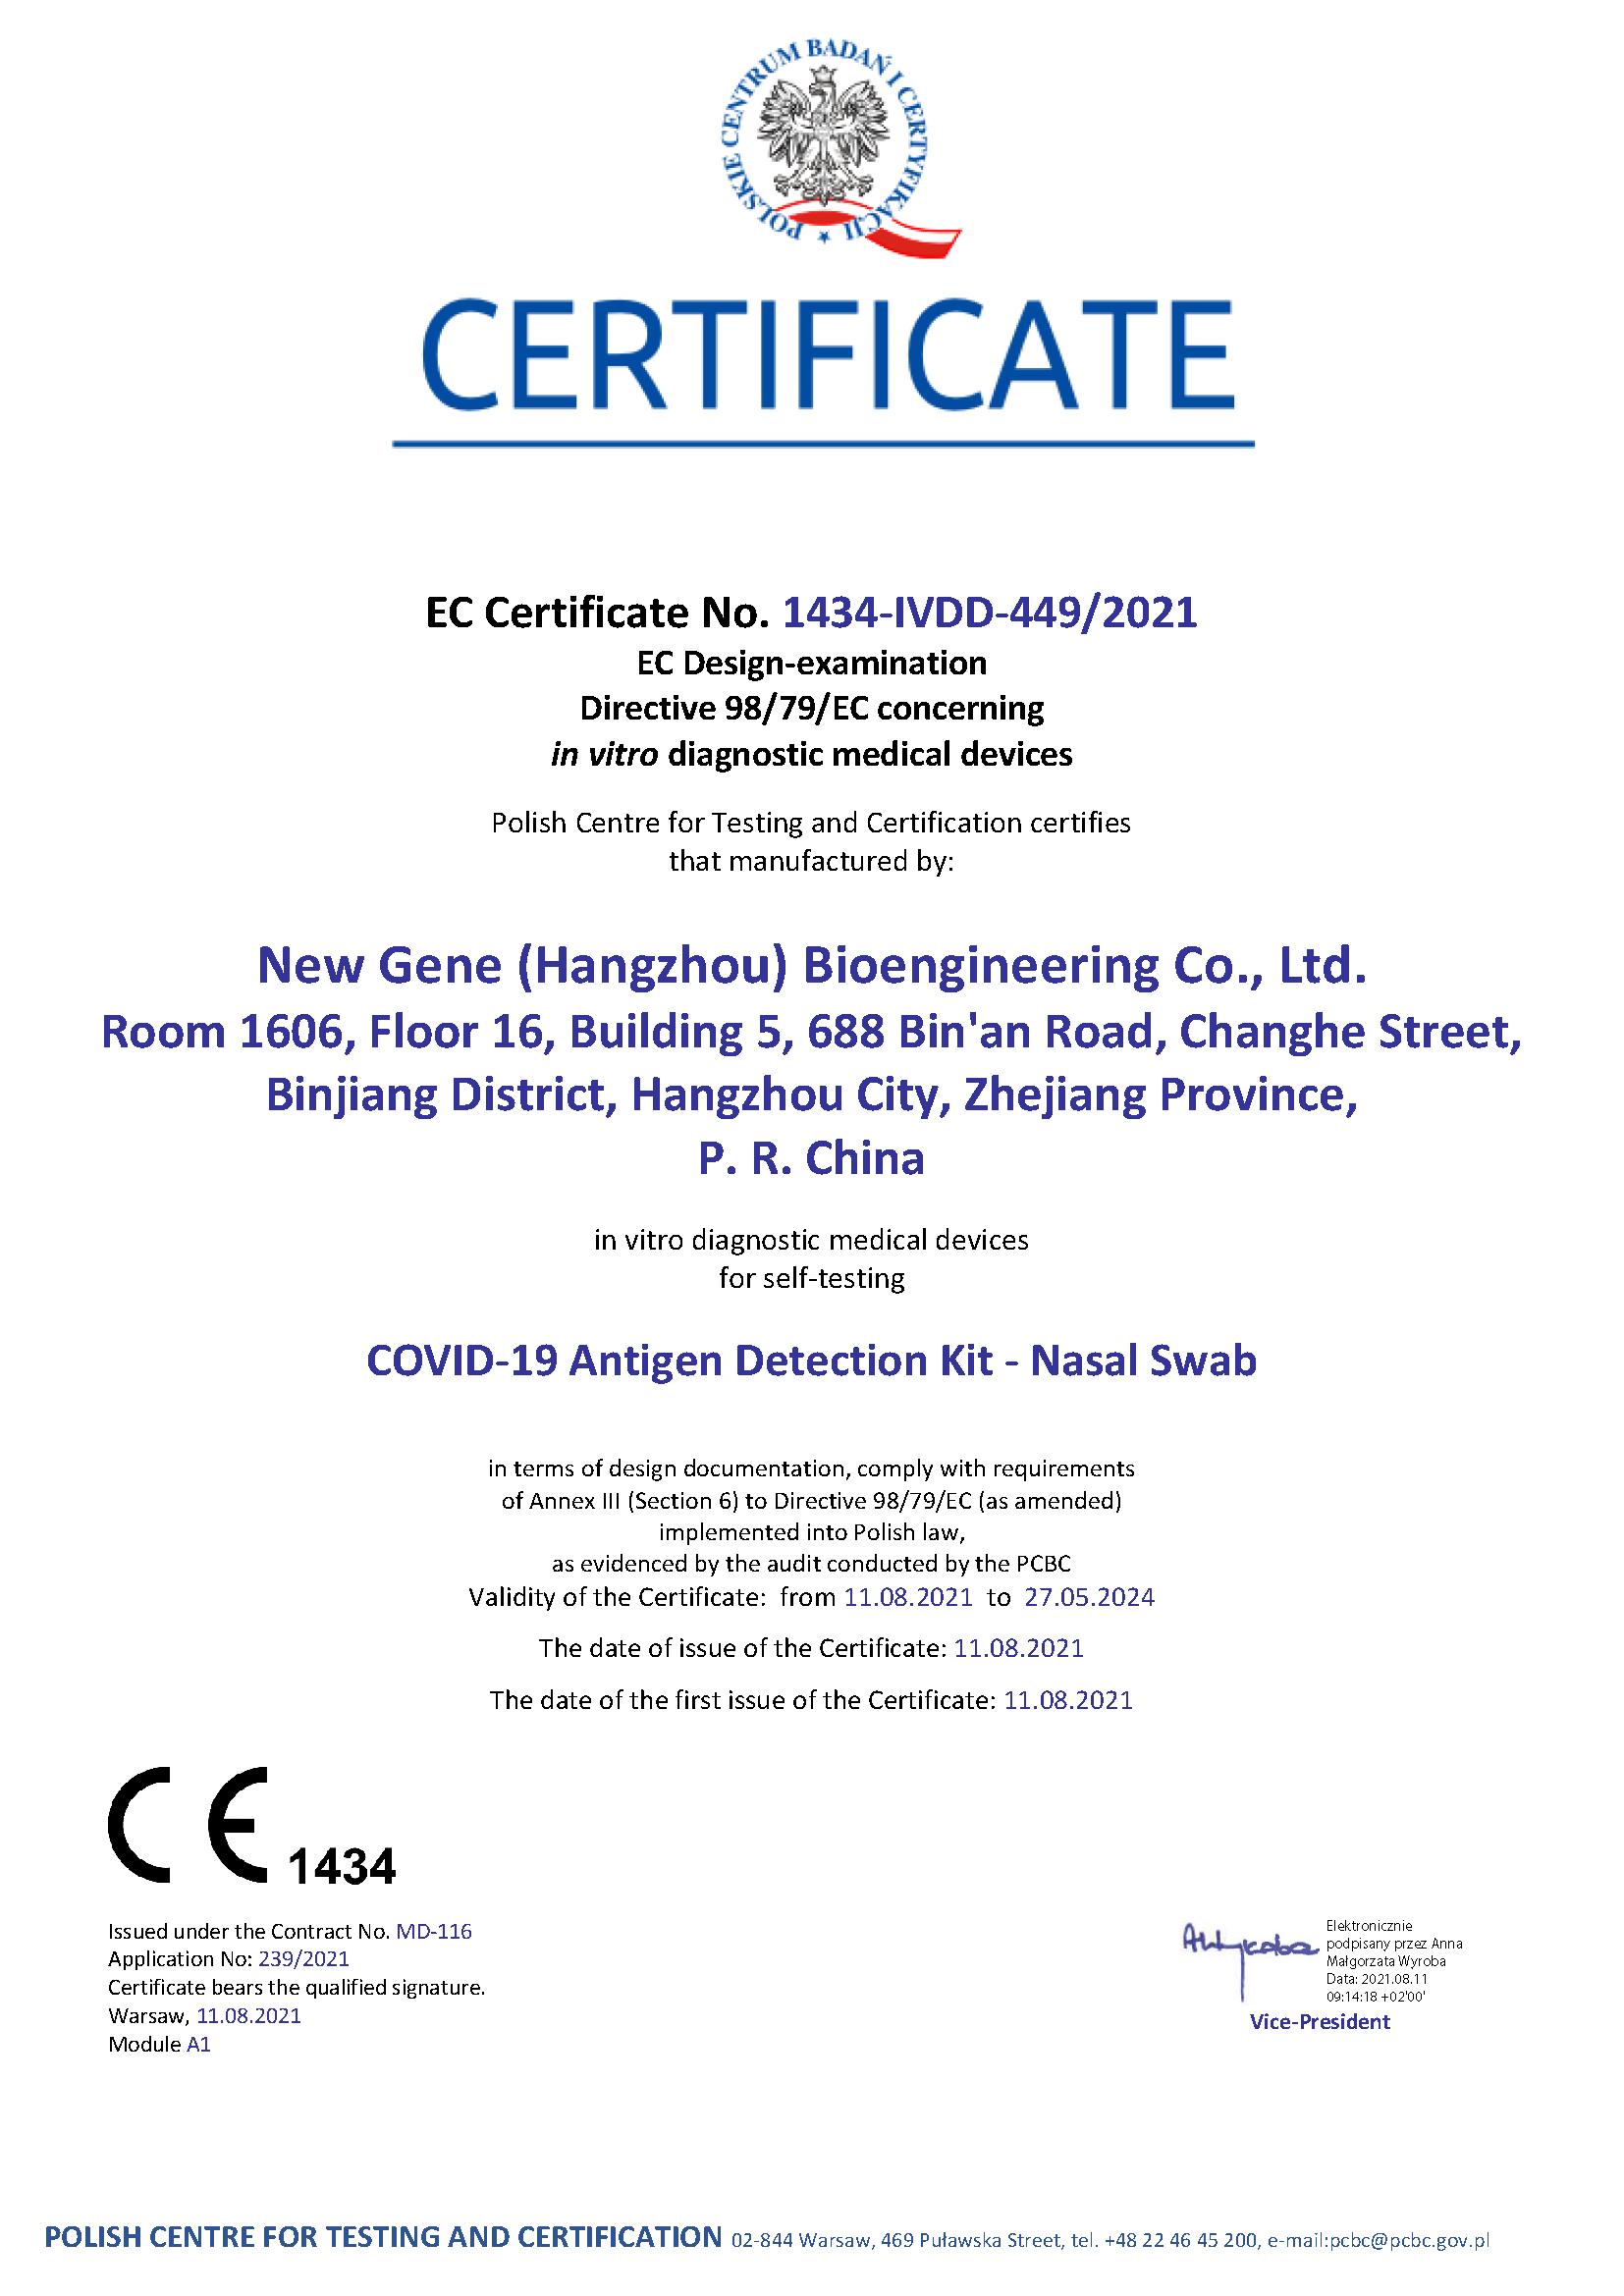 New Gene COVID-19 Antigen Detection Kit -  Self Test Certificate(PCBC 1434)